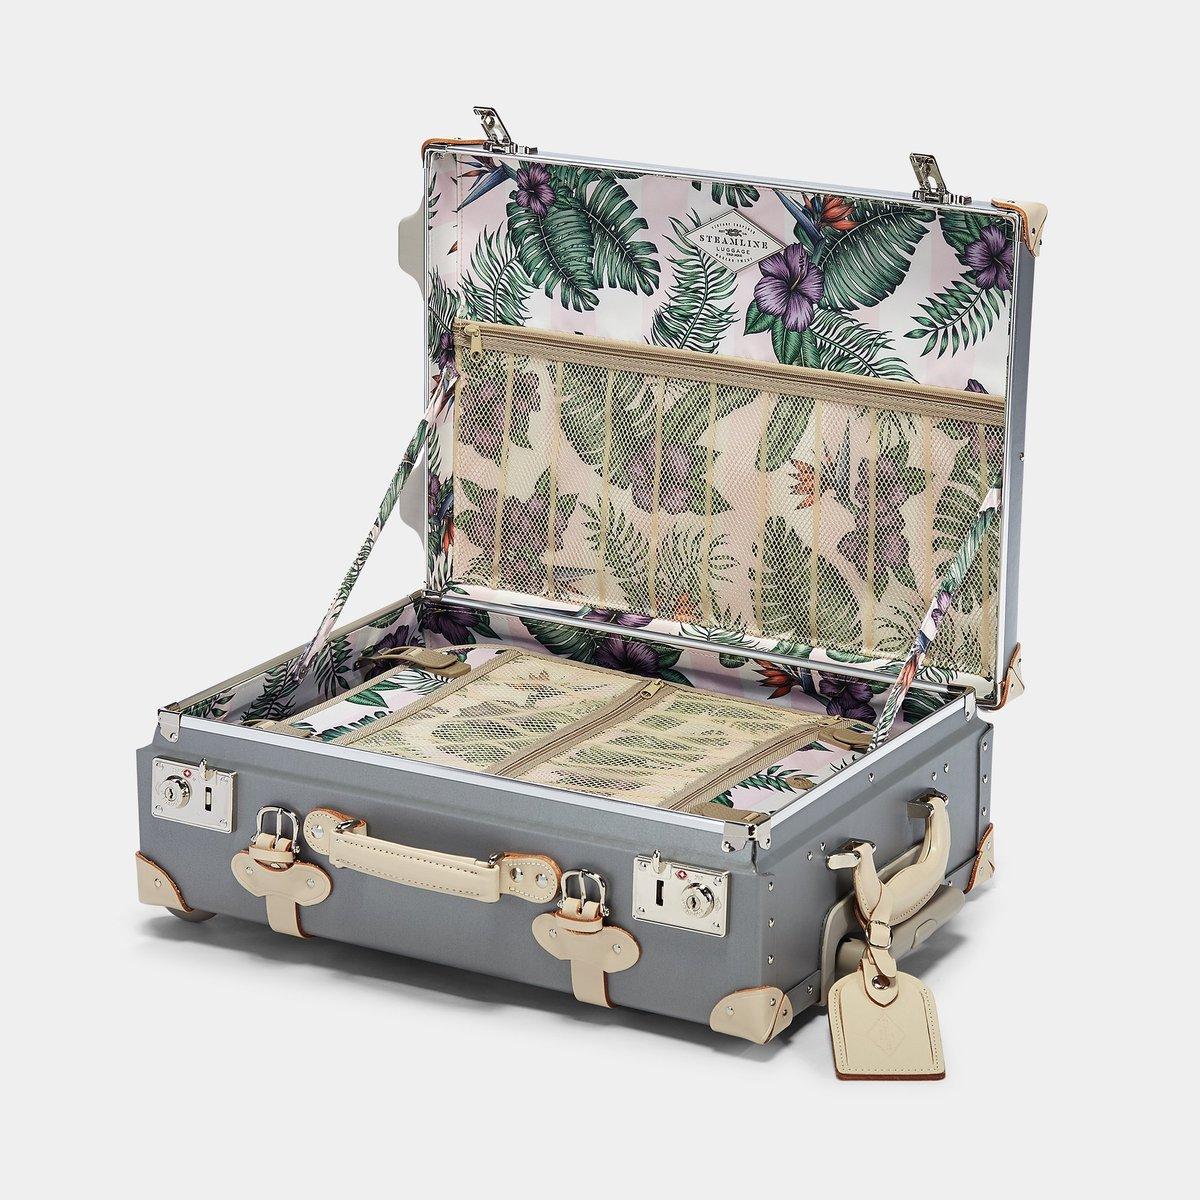 Streamline Luggage $850